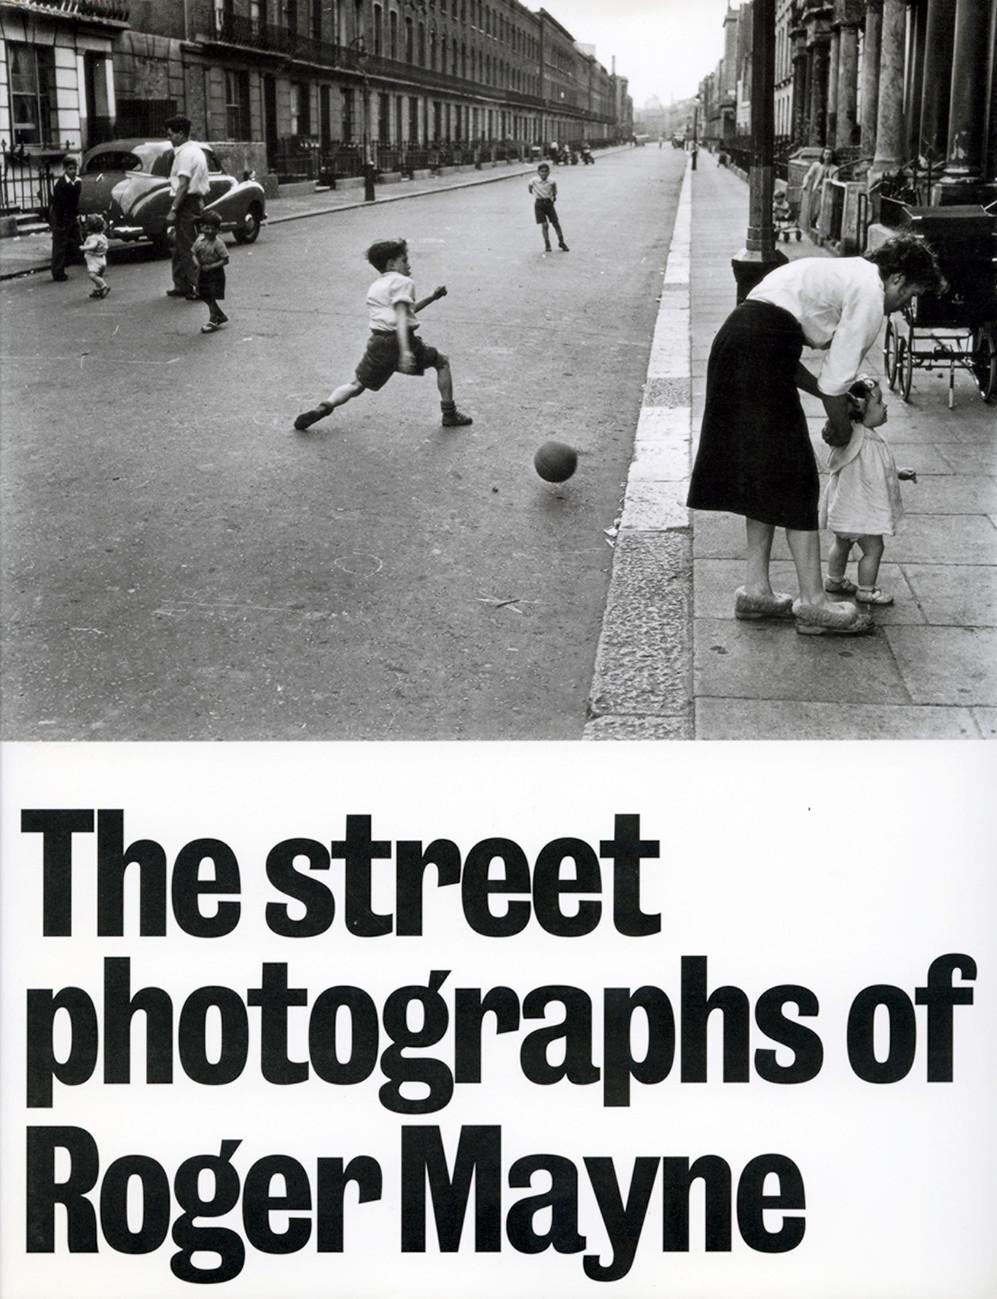 Southam Street, London, 1960's by Roger Mayne